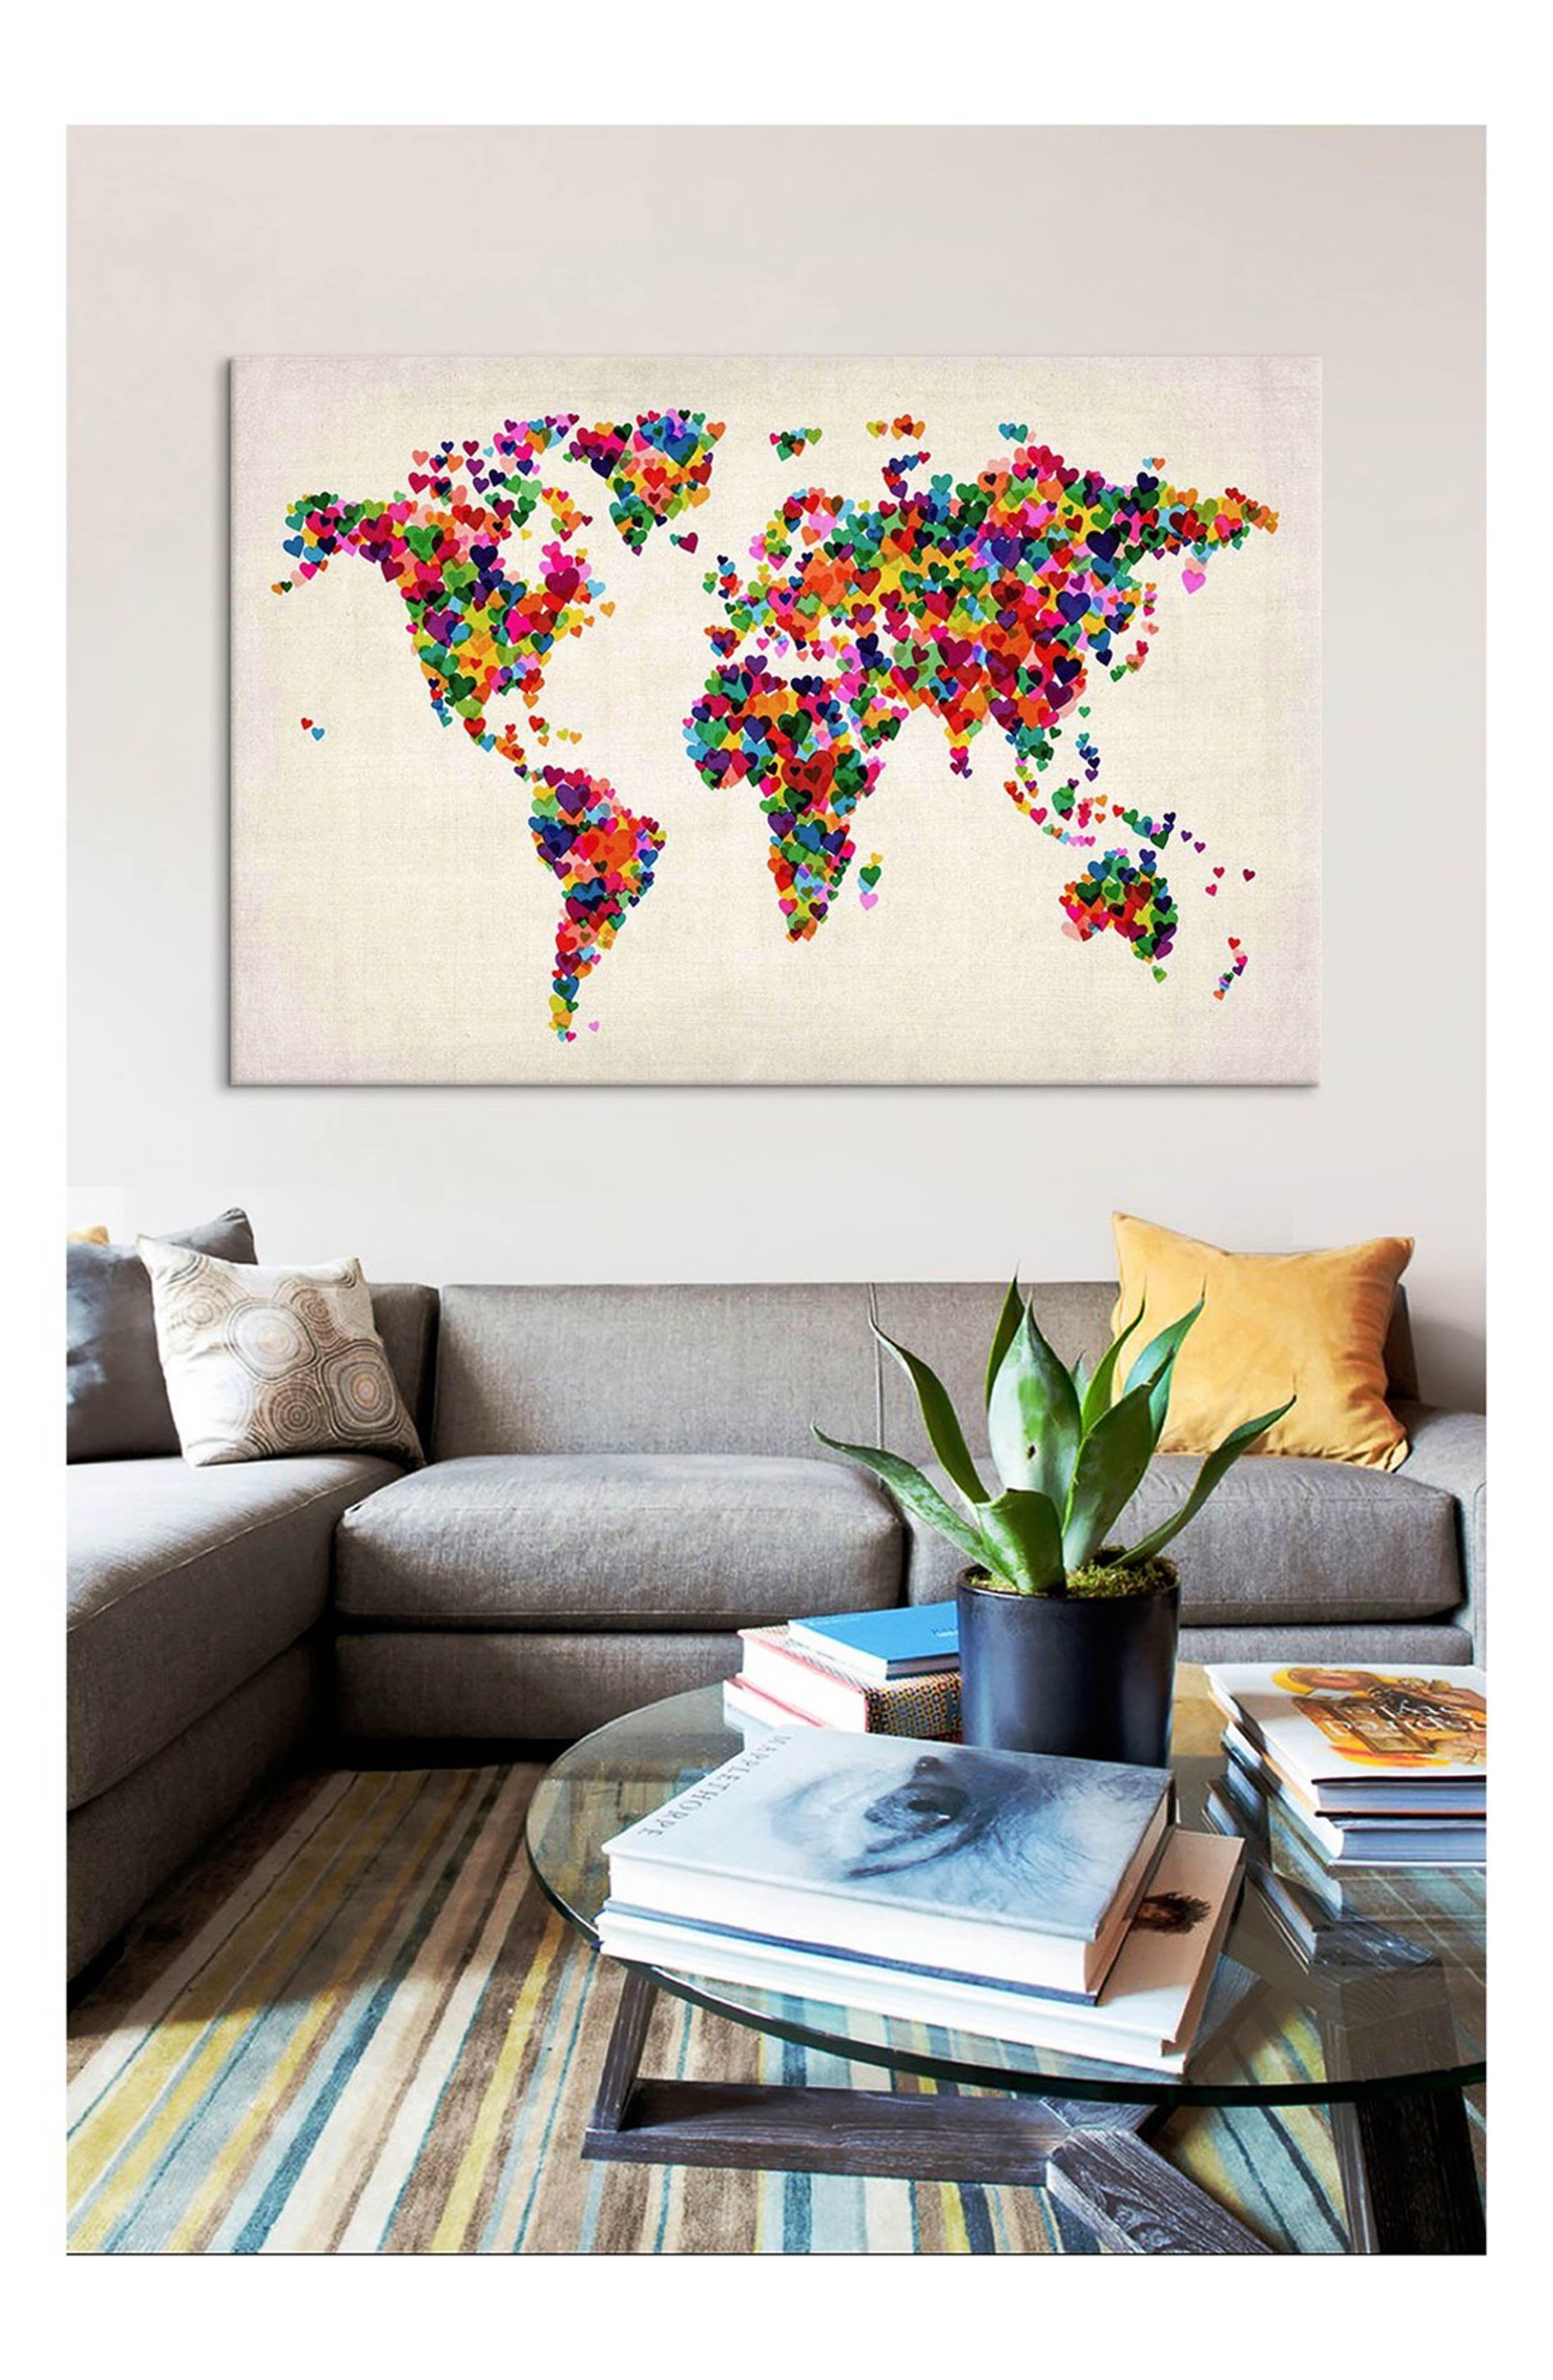 World map hearts michael thompsett gicle print canvas art world map hearts michael thompsett gicle print canvas art gumiabroncs Image collections